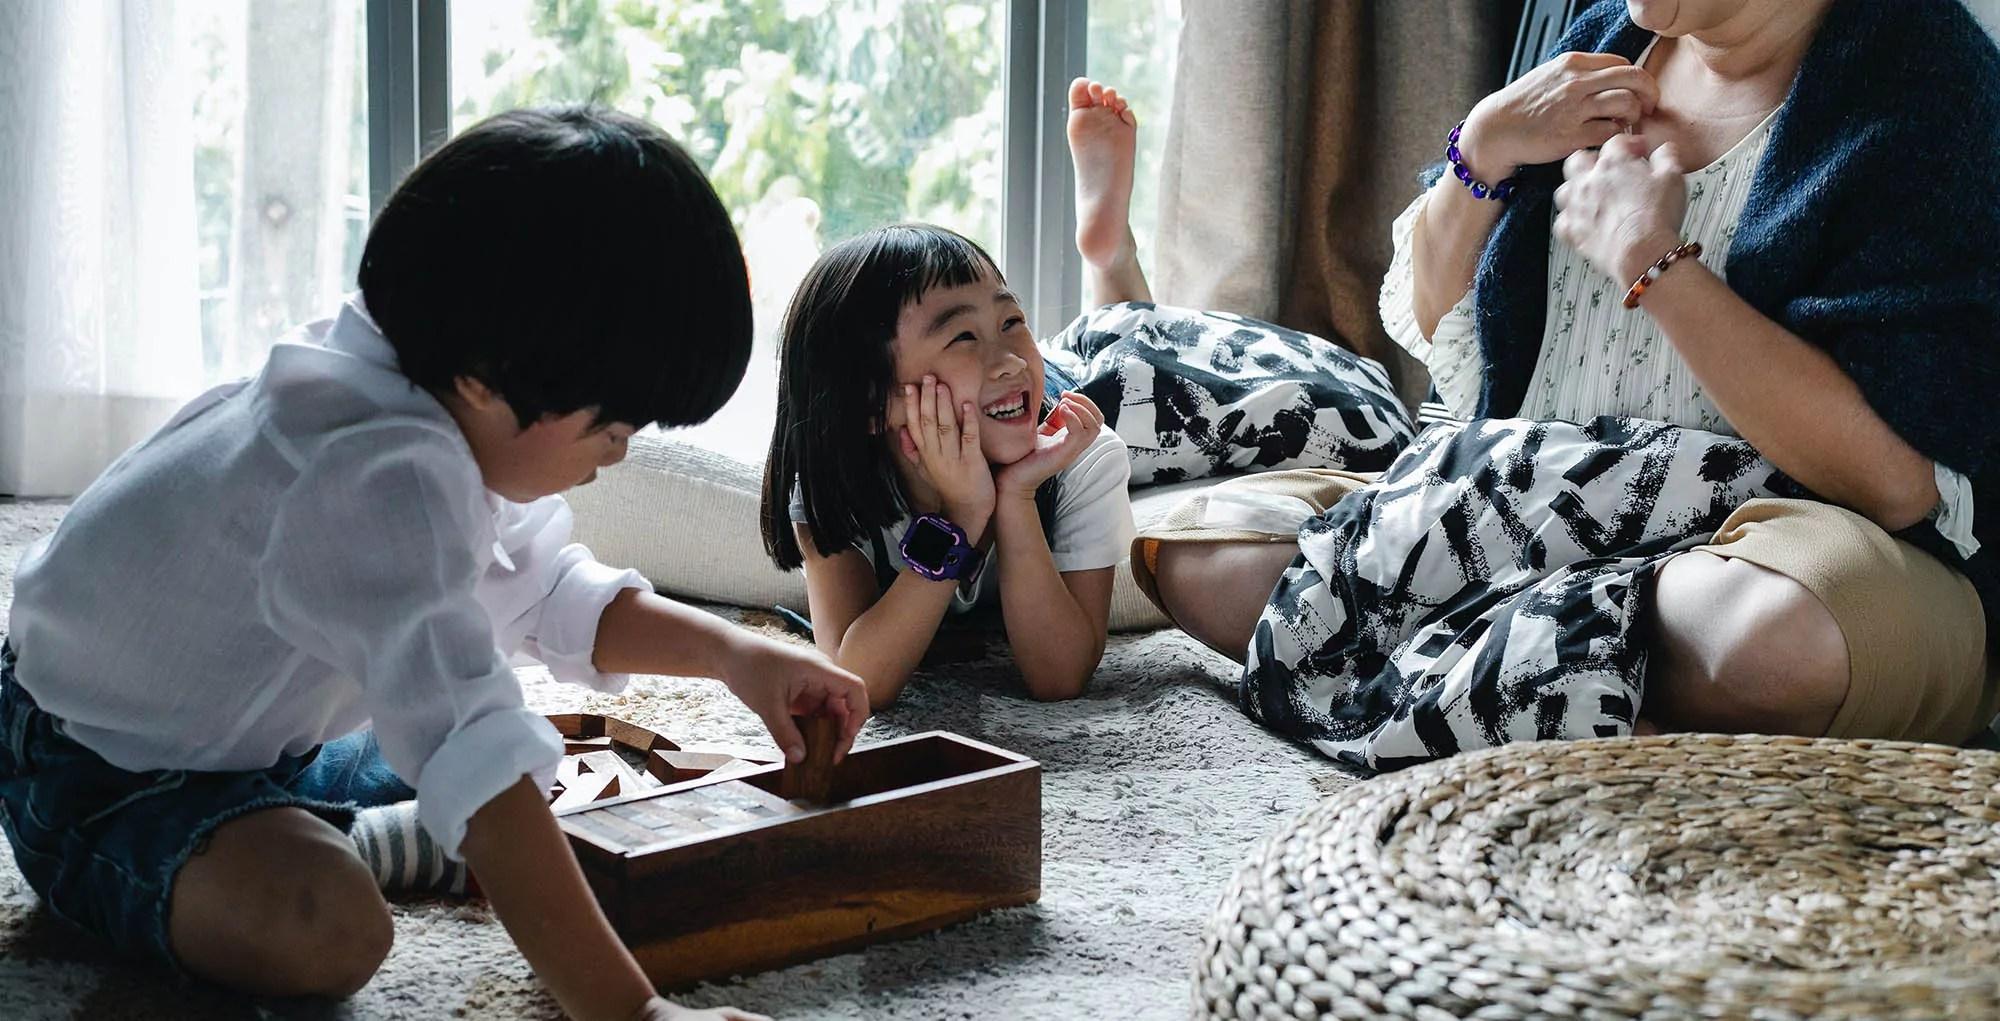 Just Real Moms 10 Ideias de Jogos Infantis Twinkl Jogos